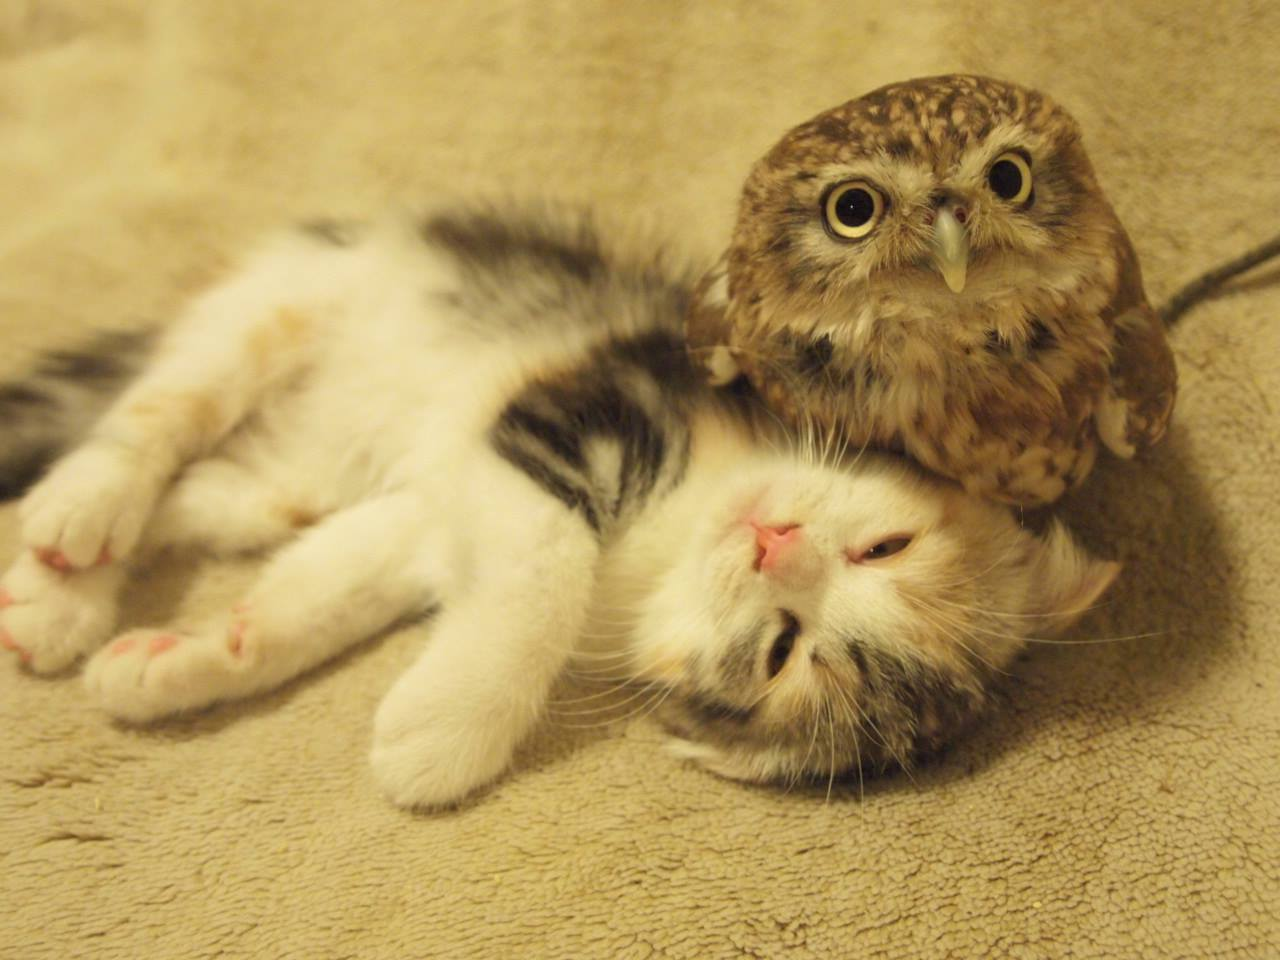 Kitten and owl hukulou coffee